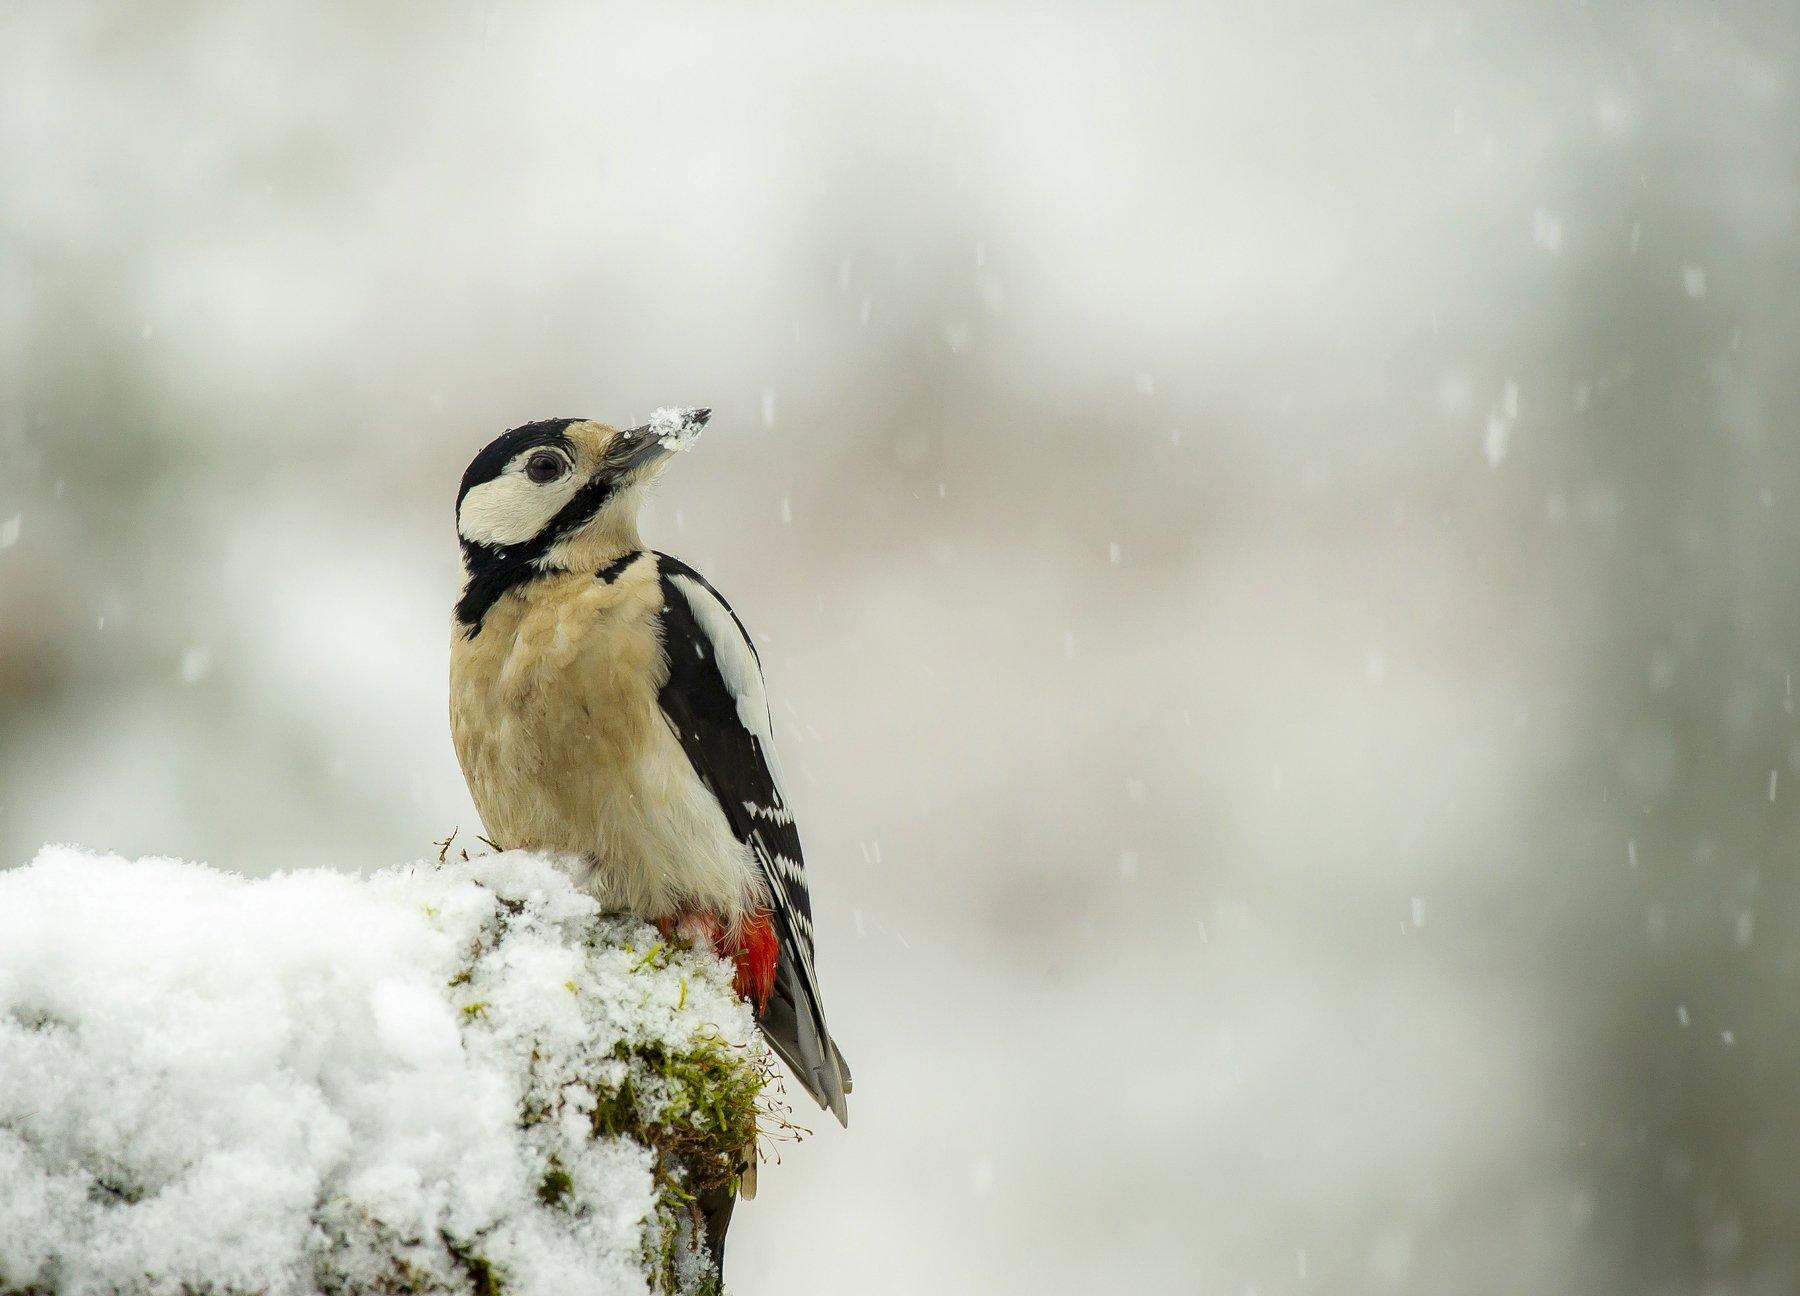 птицы,природа, зима, Киселёв Андрей